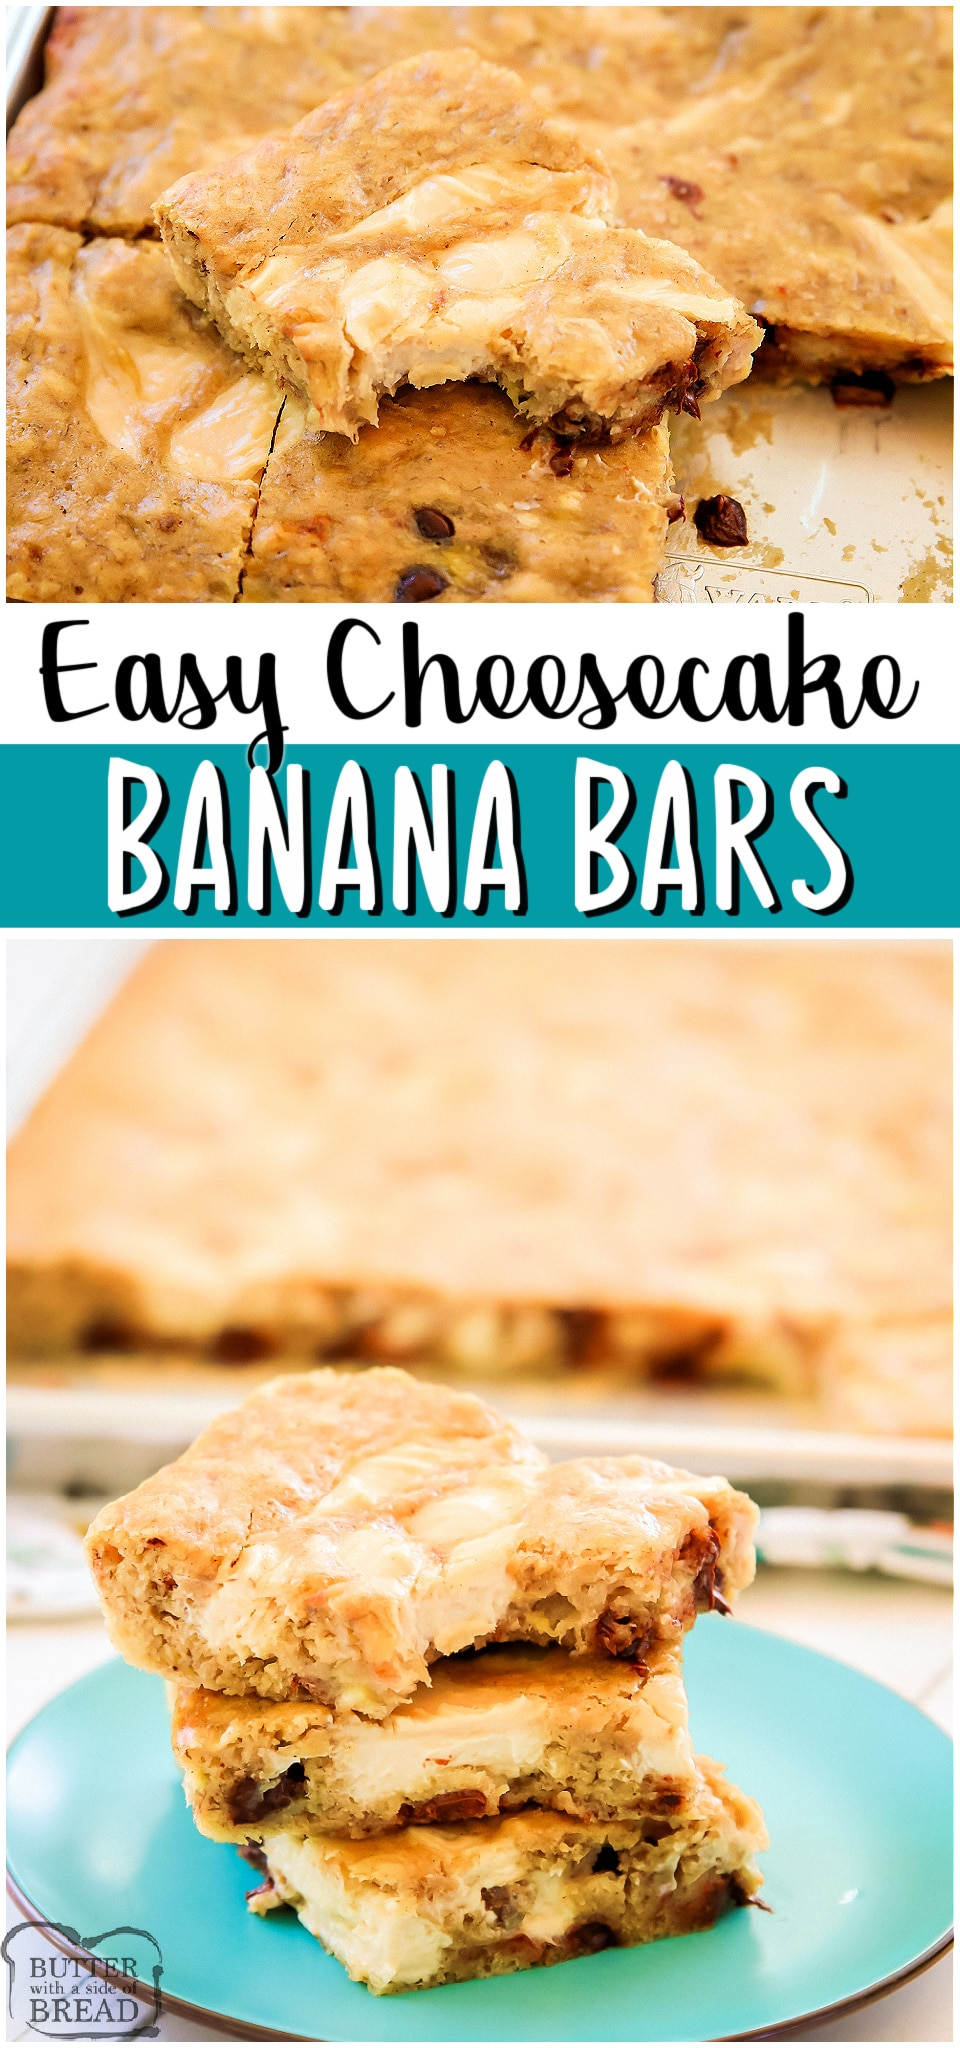 Cheesecake banana bars are soft, flavorful cinnamon banana bars with a vanilla cheesecake swirl! Easy recipe for ripe bananas that's so much better than banana bread! #bananas #cake #dessert #cheesecake #baking #easyrecipe from BUTTER WITH A SIDE OF BREAD